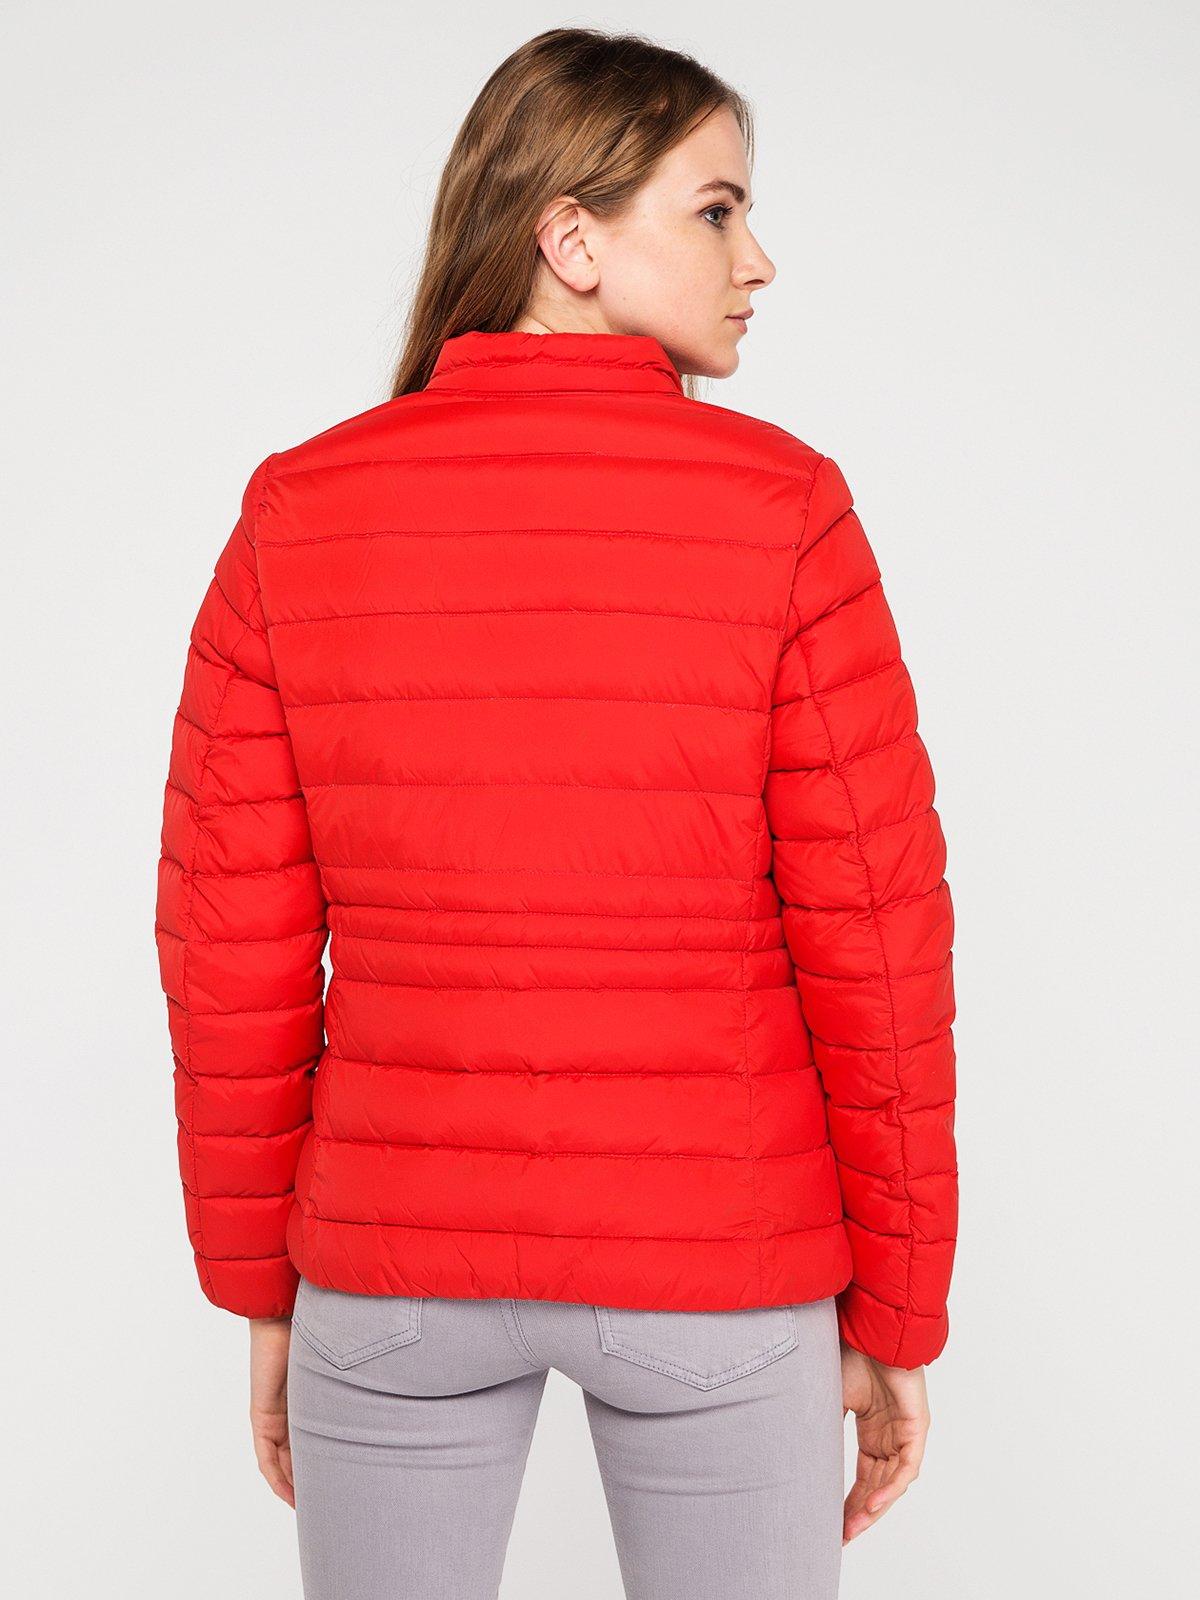 Куртка красная | 3606550 | фото 4